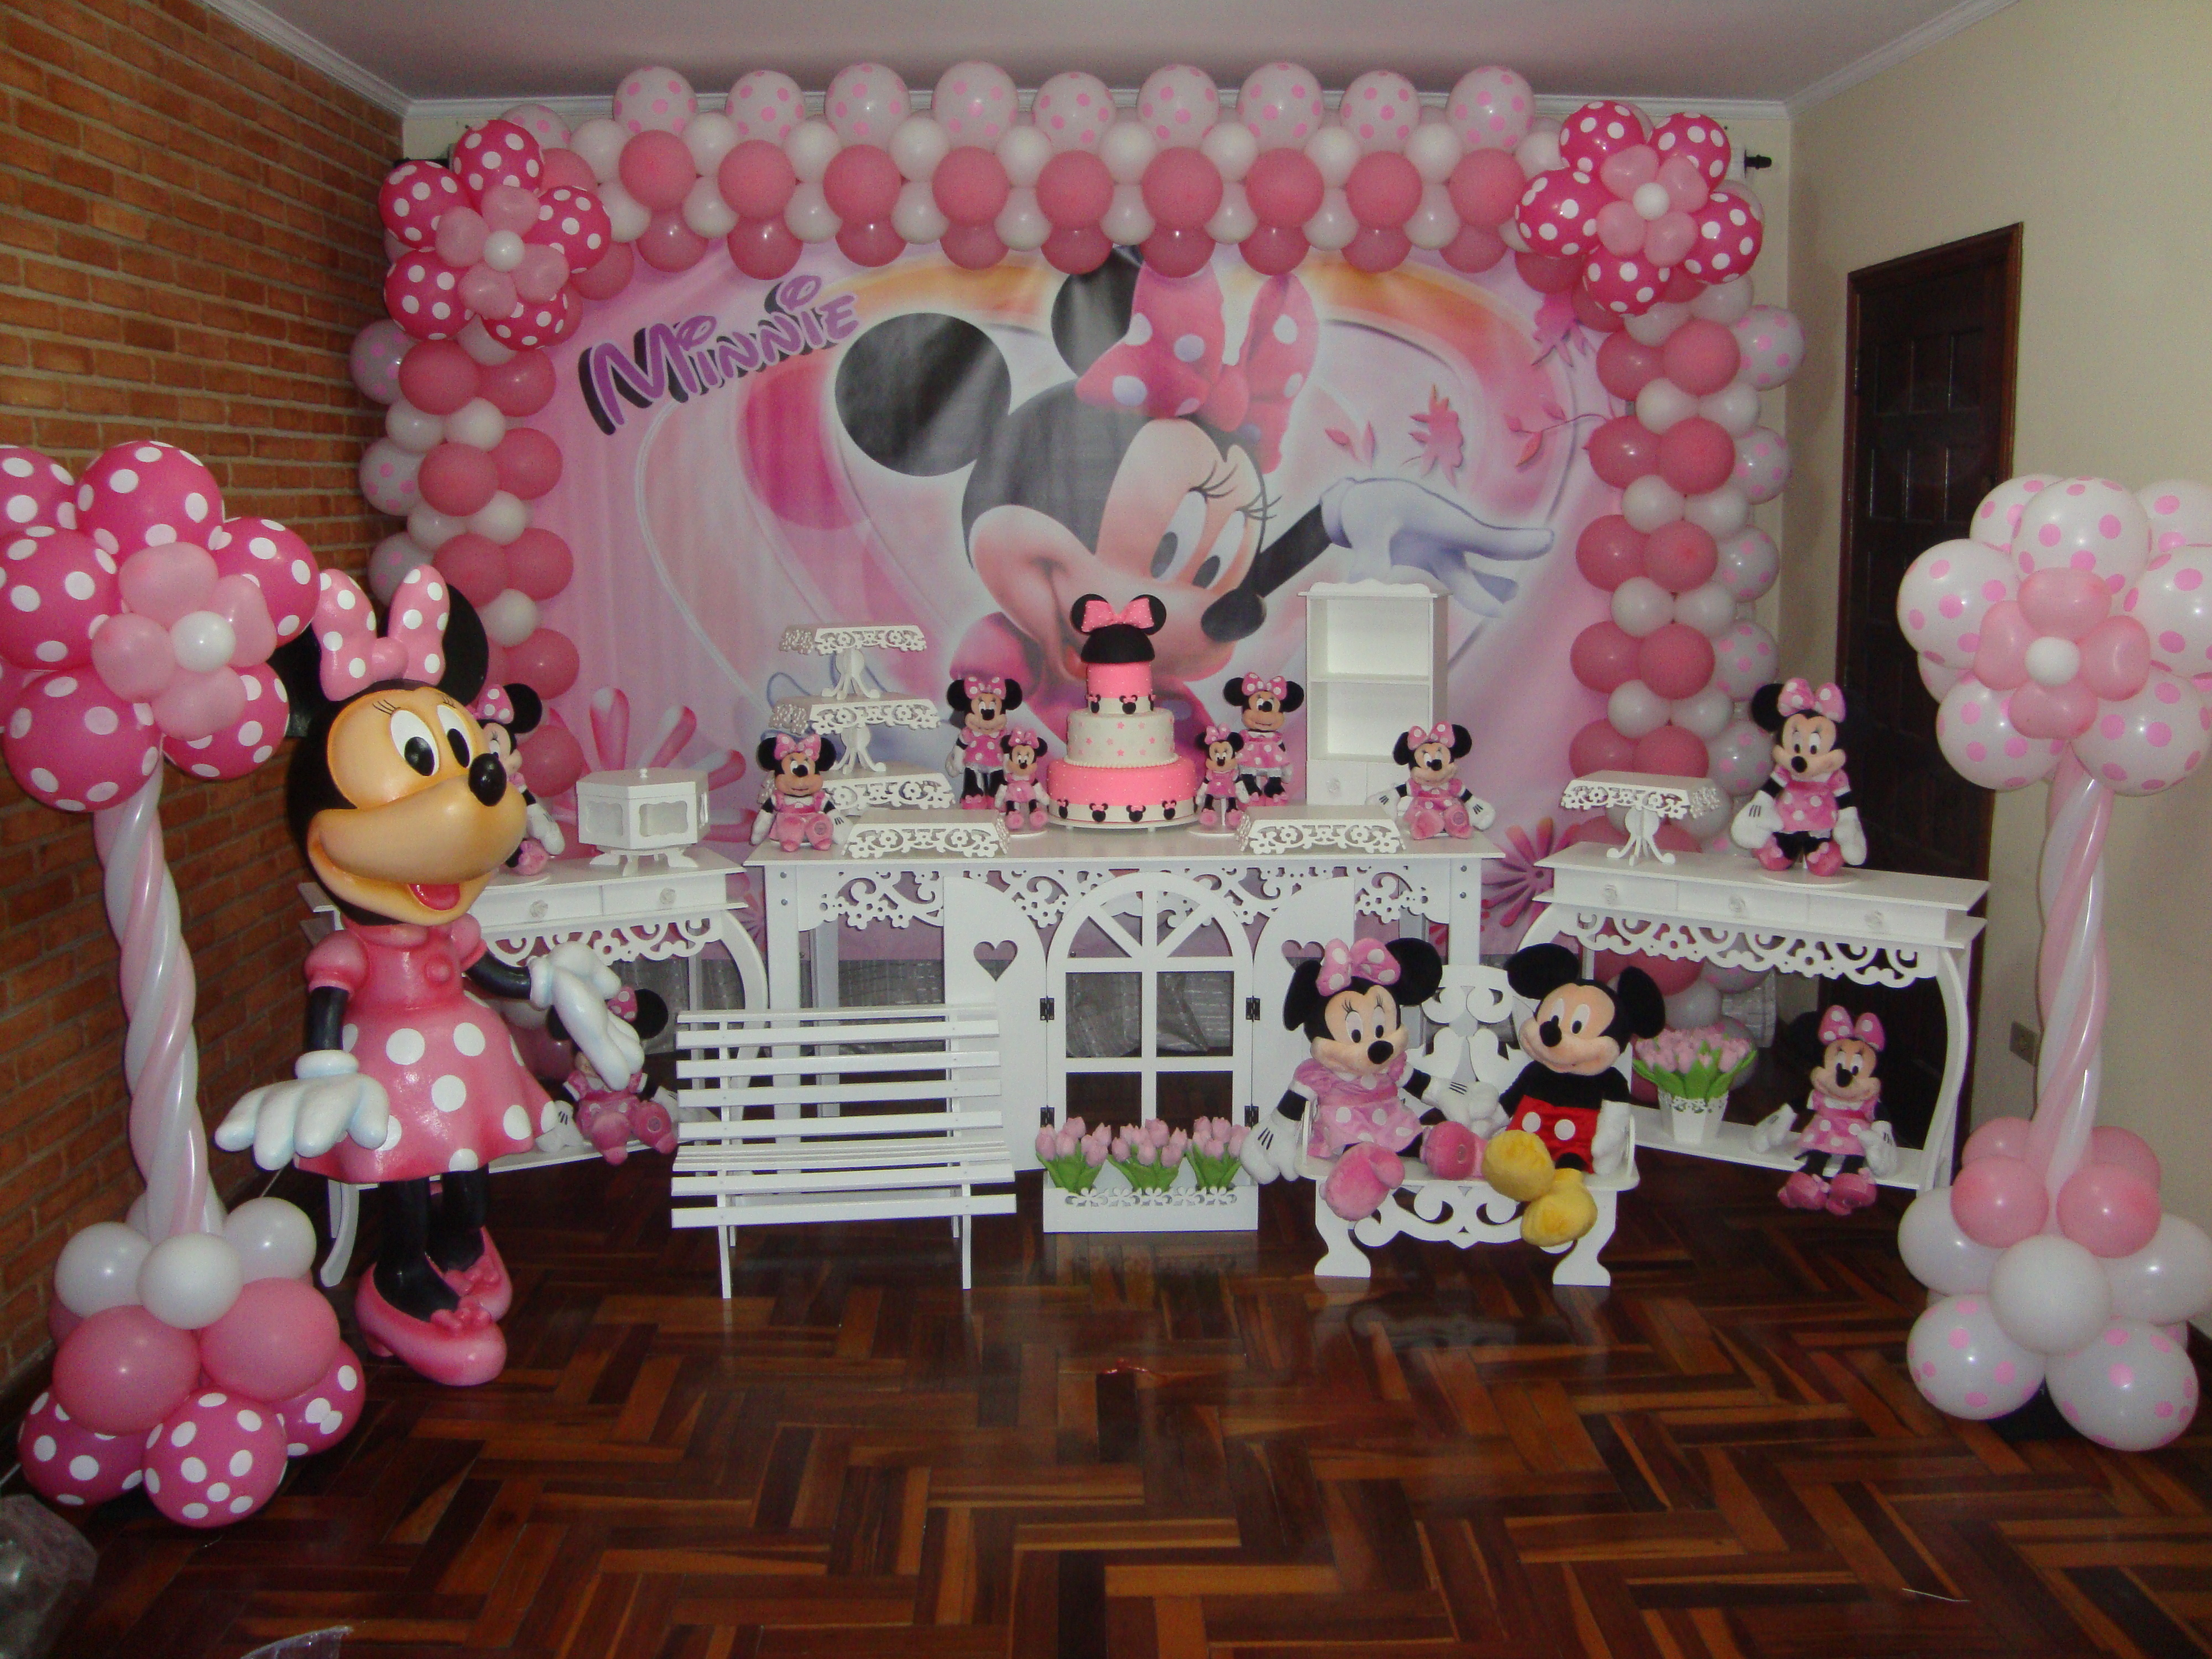 decoracao festa minnie rosa : decoracao festa minnie rosa: minnie rosa clean minnie rosa decoracao minnie rosa minnie rosa